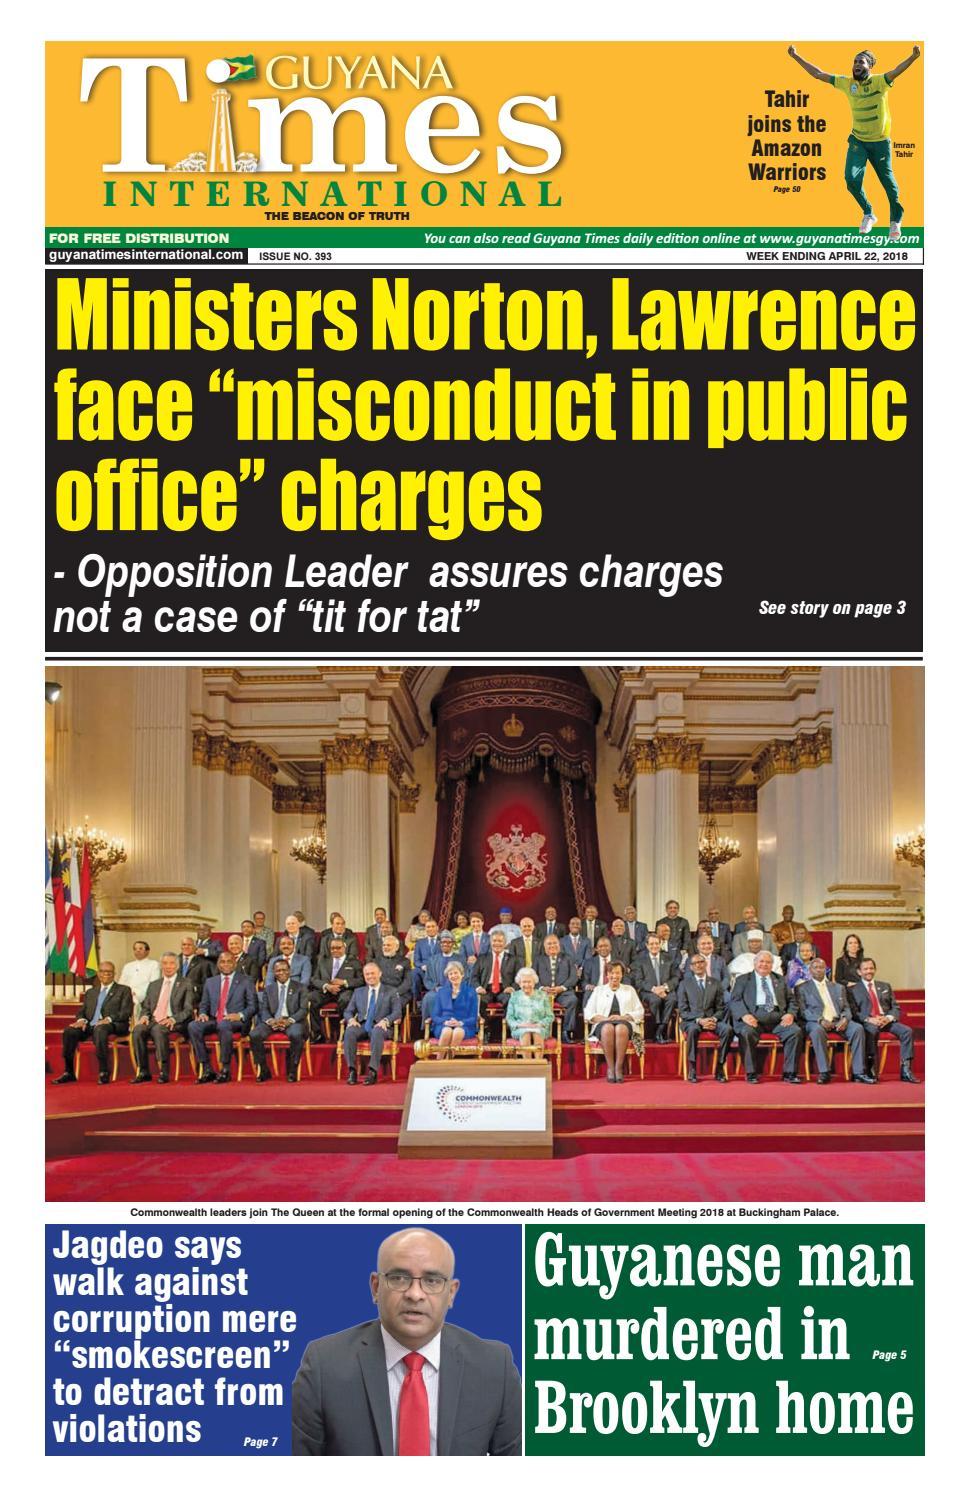 Guyana Times International April 24 2018 by Gytimes - issuu